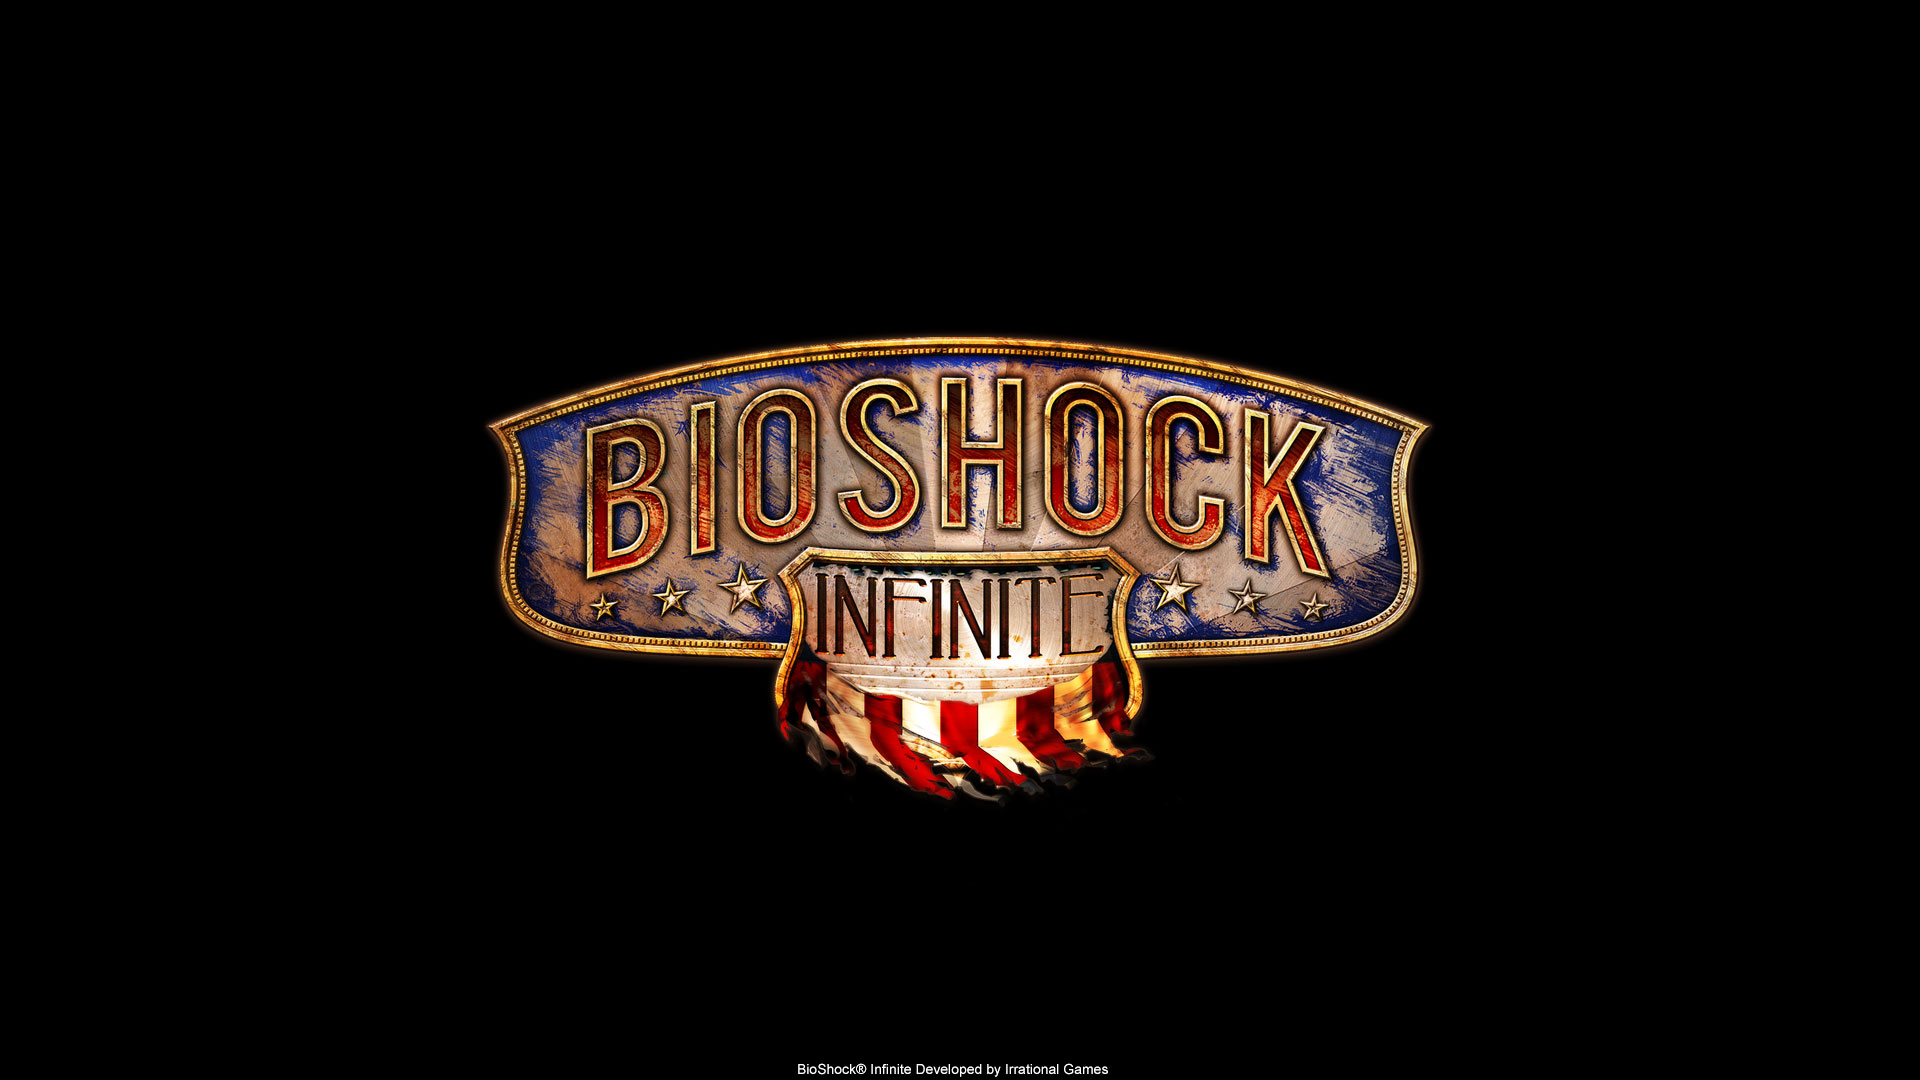 Bioshock Infinite wallpaper 1